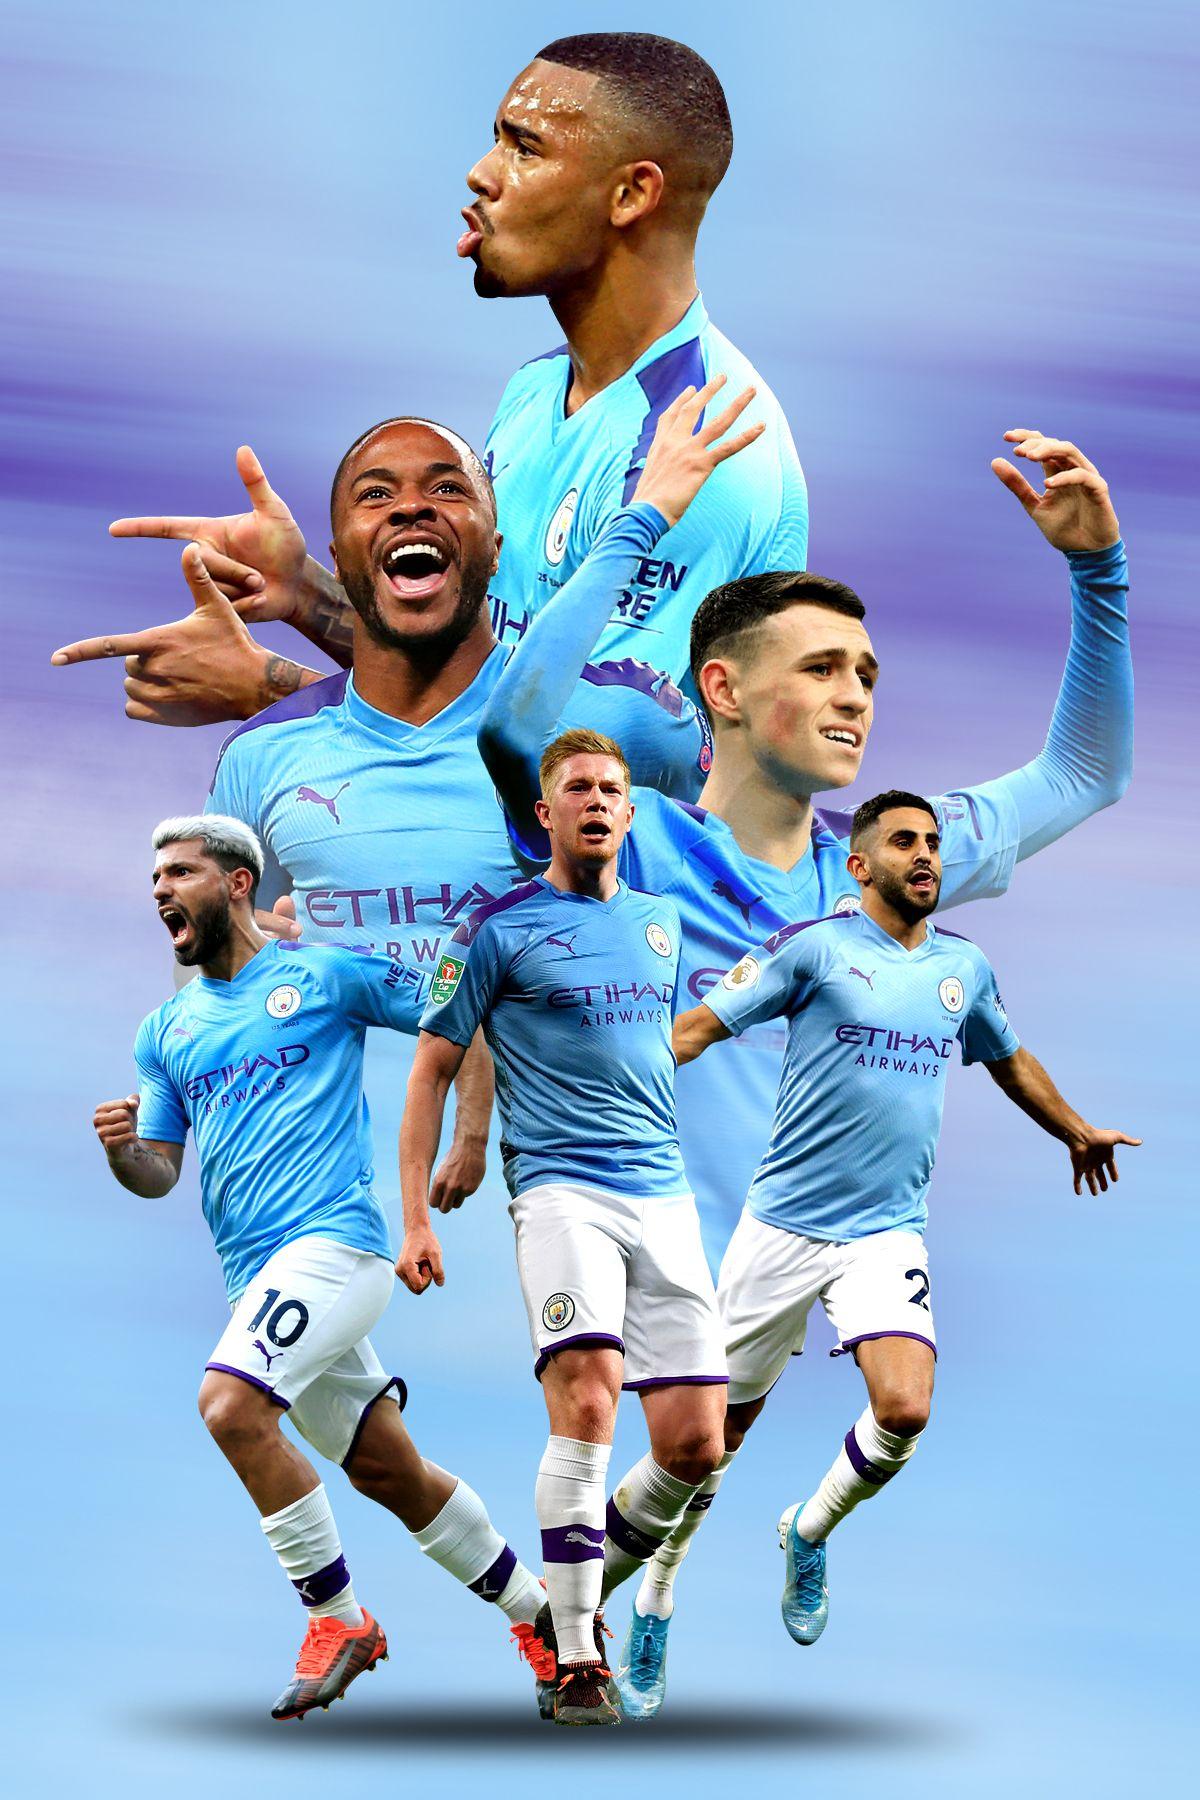 Manchester City Poster   Manchester city, Gambar sepak bola, Sepak bola